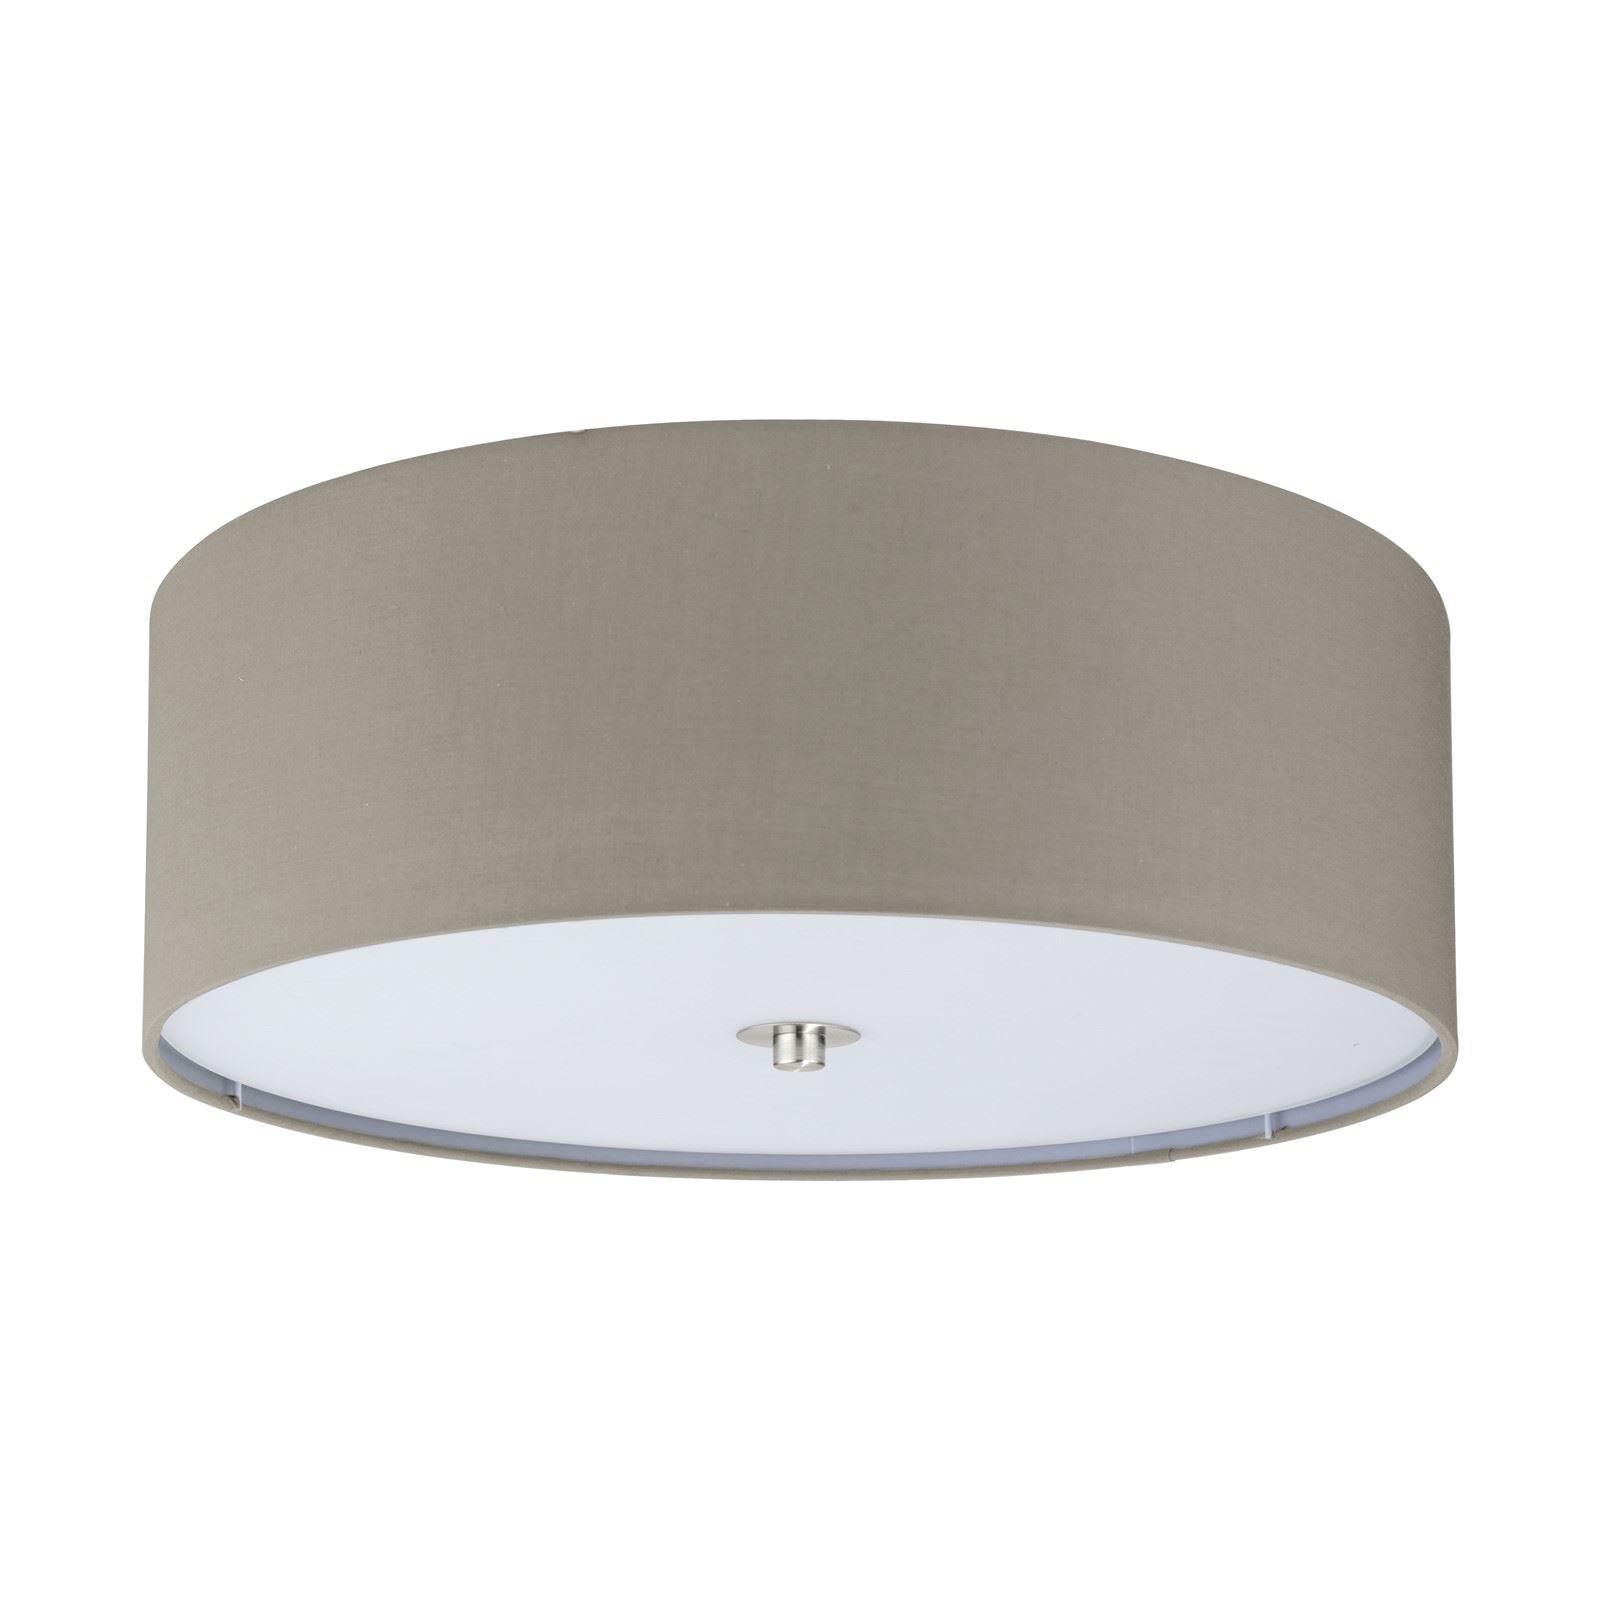 Decorative 3 Ceiling Light Satin Nickel Fabric Glass Taupe Shade